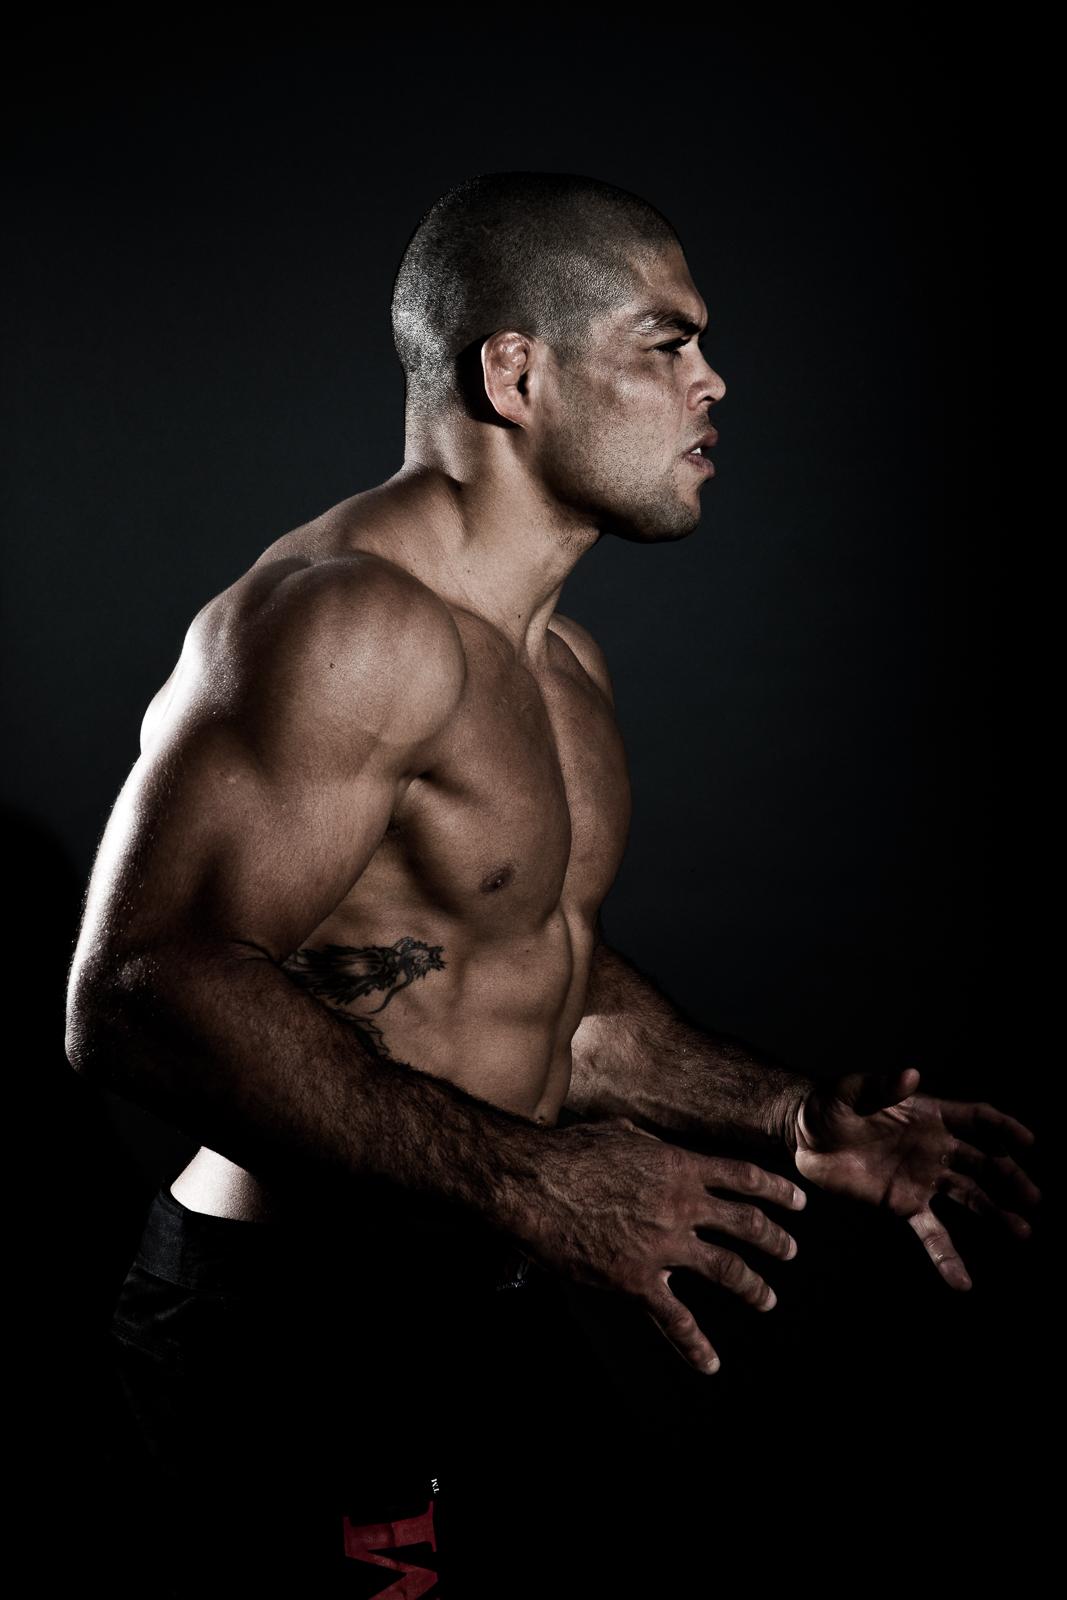 Andre Galvão Brazilian Jiu-Jitsu athlete and ADCC Champion for BJJ Style magazine. Photo by Flavio Scorsato